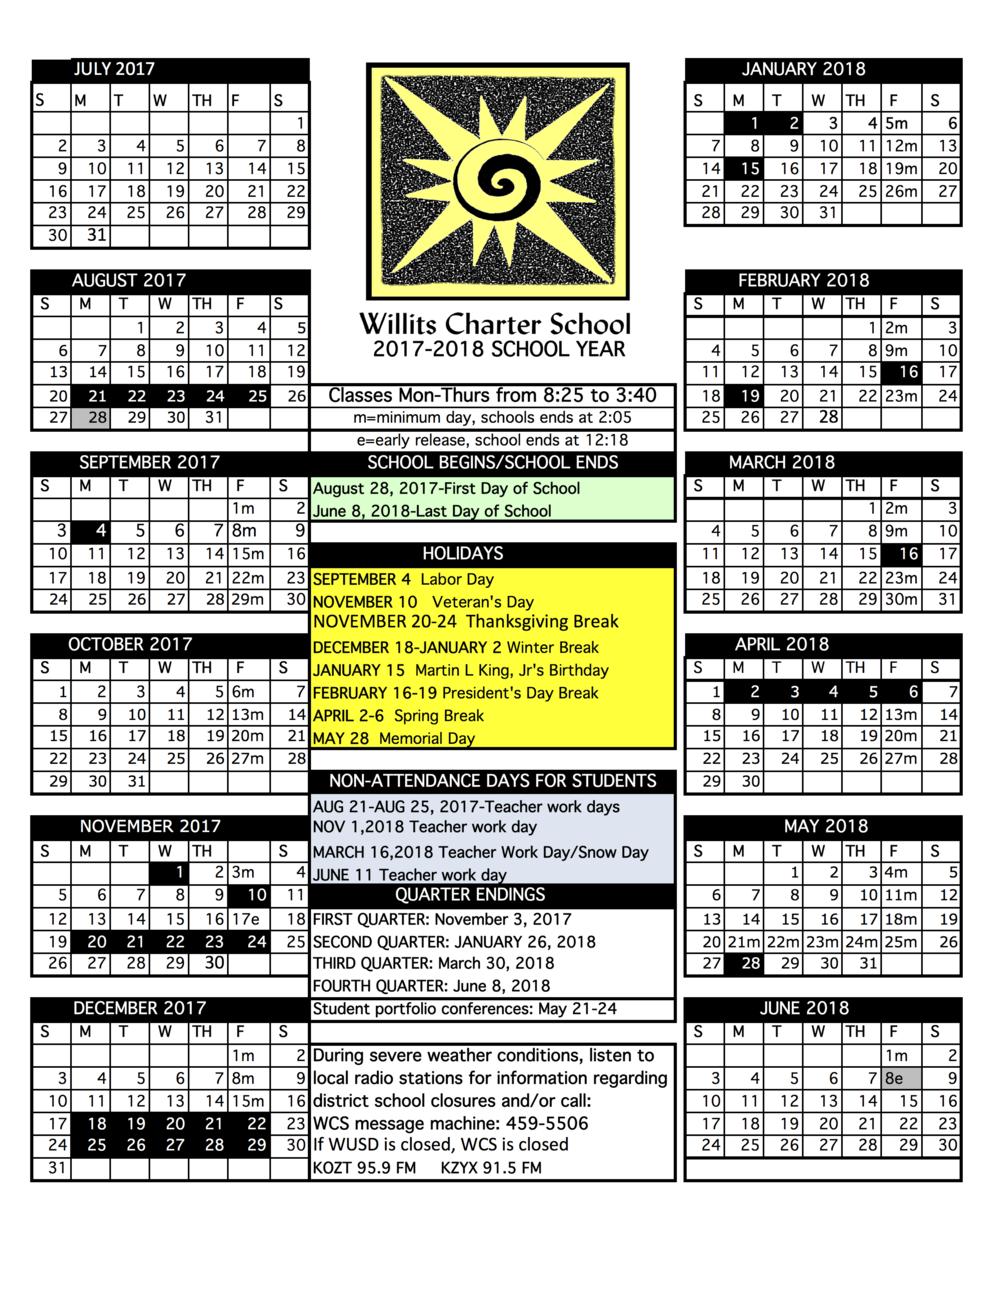 2017-18 WCS Calendar.png